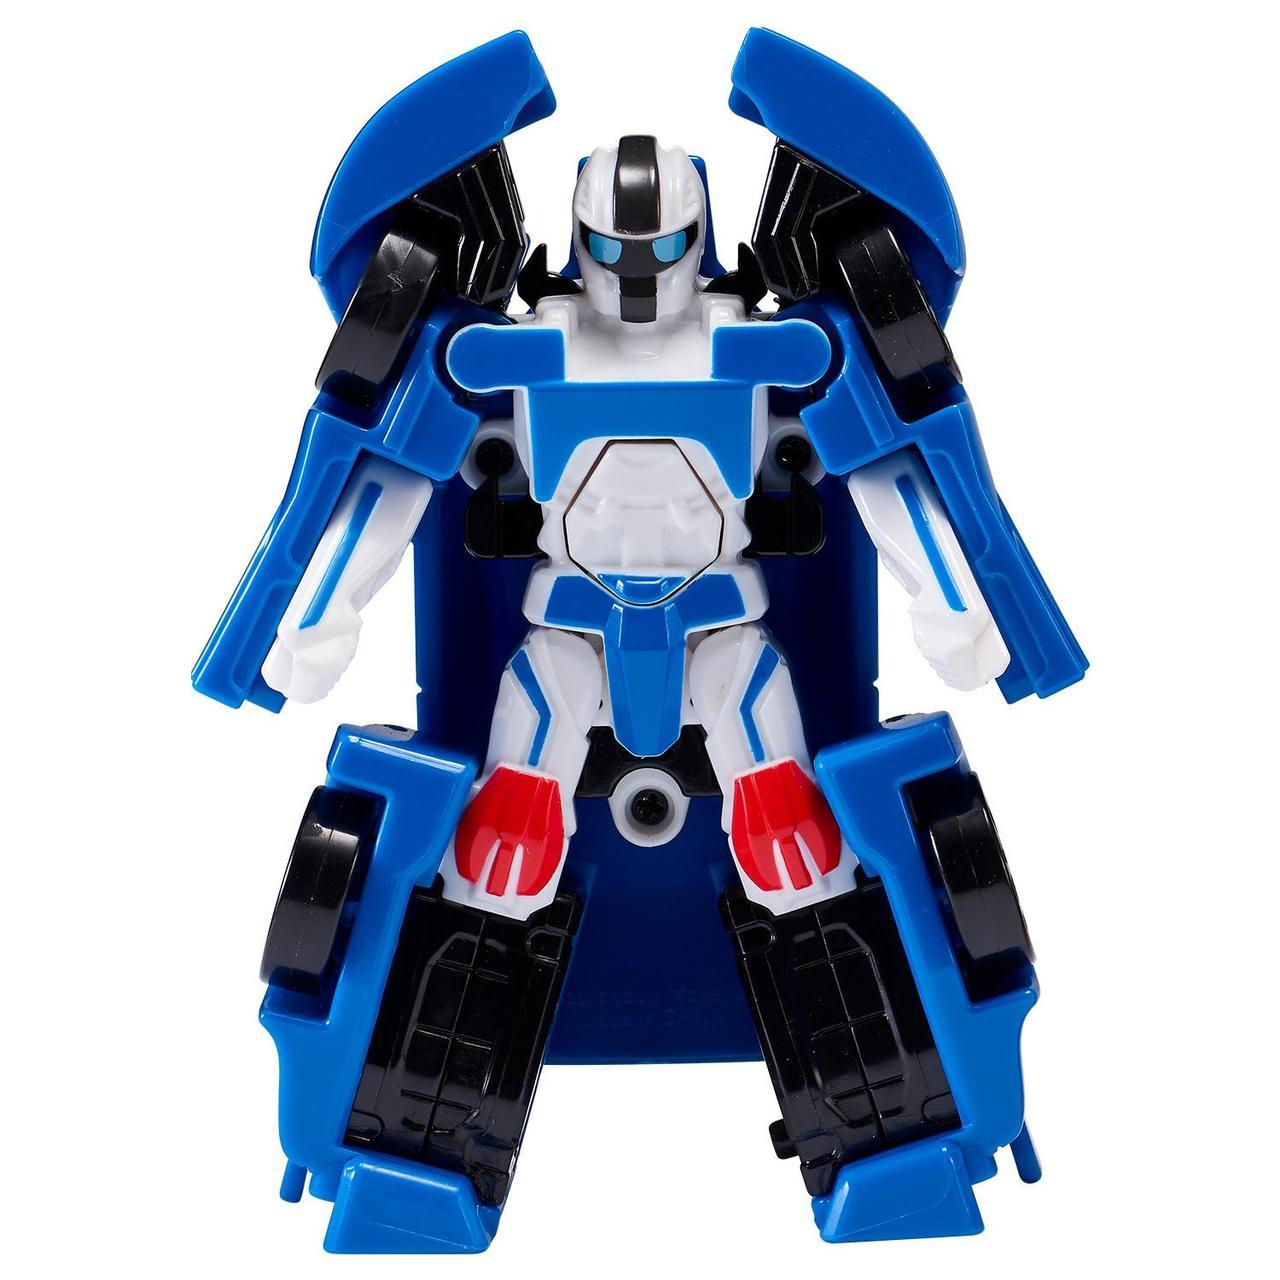 "Tobot Робот-трансформер Тобот Атлон Бета S1 ""Мини"""